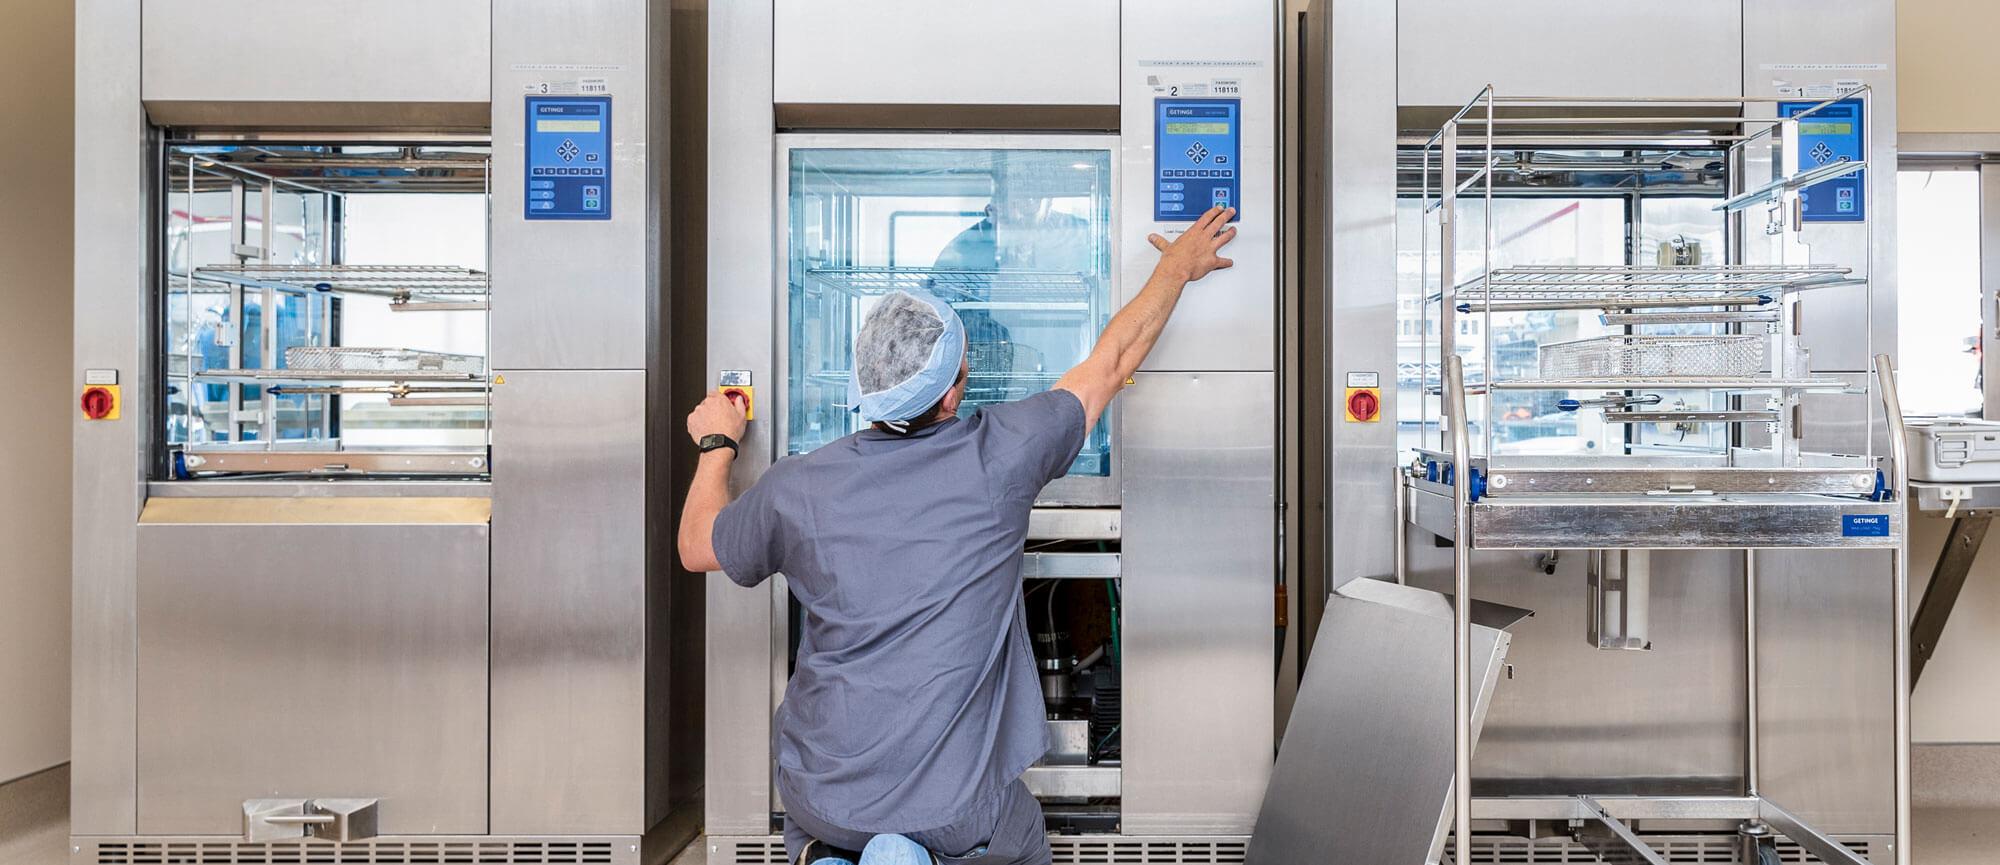 Refurbished Sterilizers & Washers, Medical Equipment